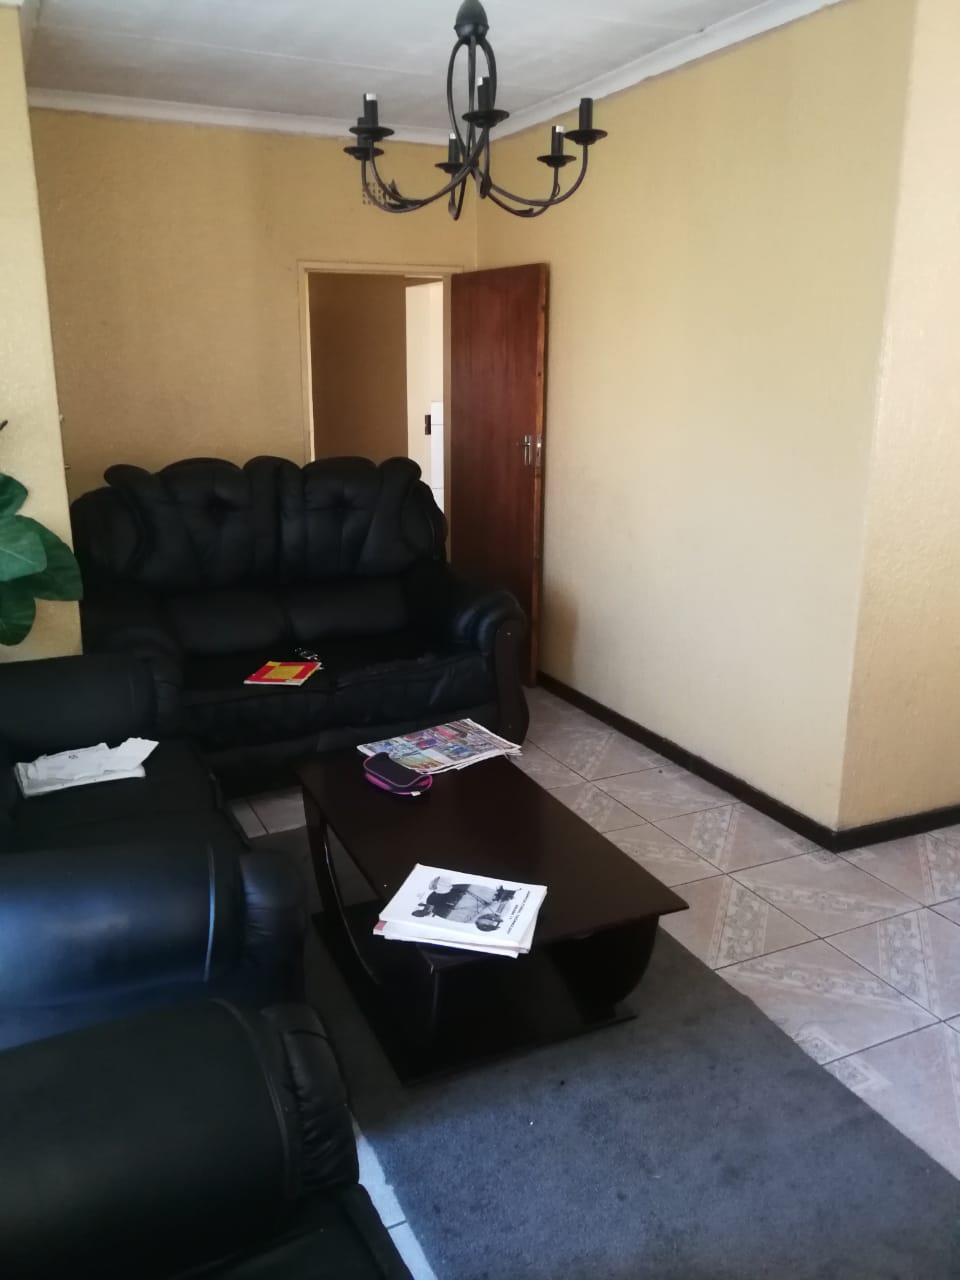 2 Bedroom House For Sale in Vereeniging Central